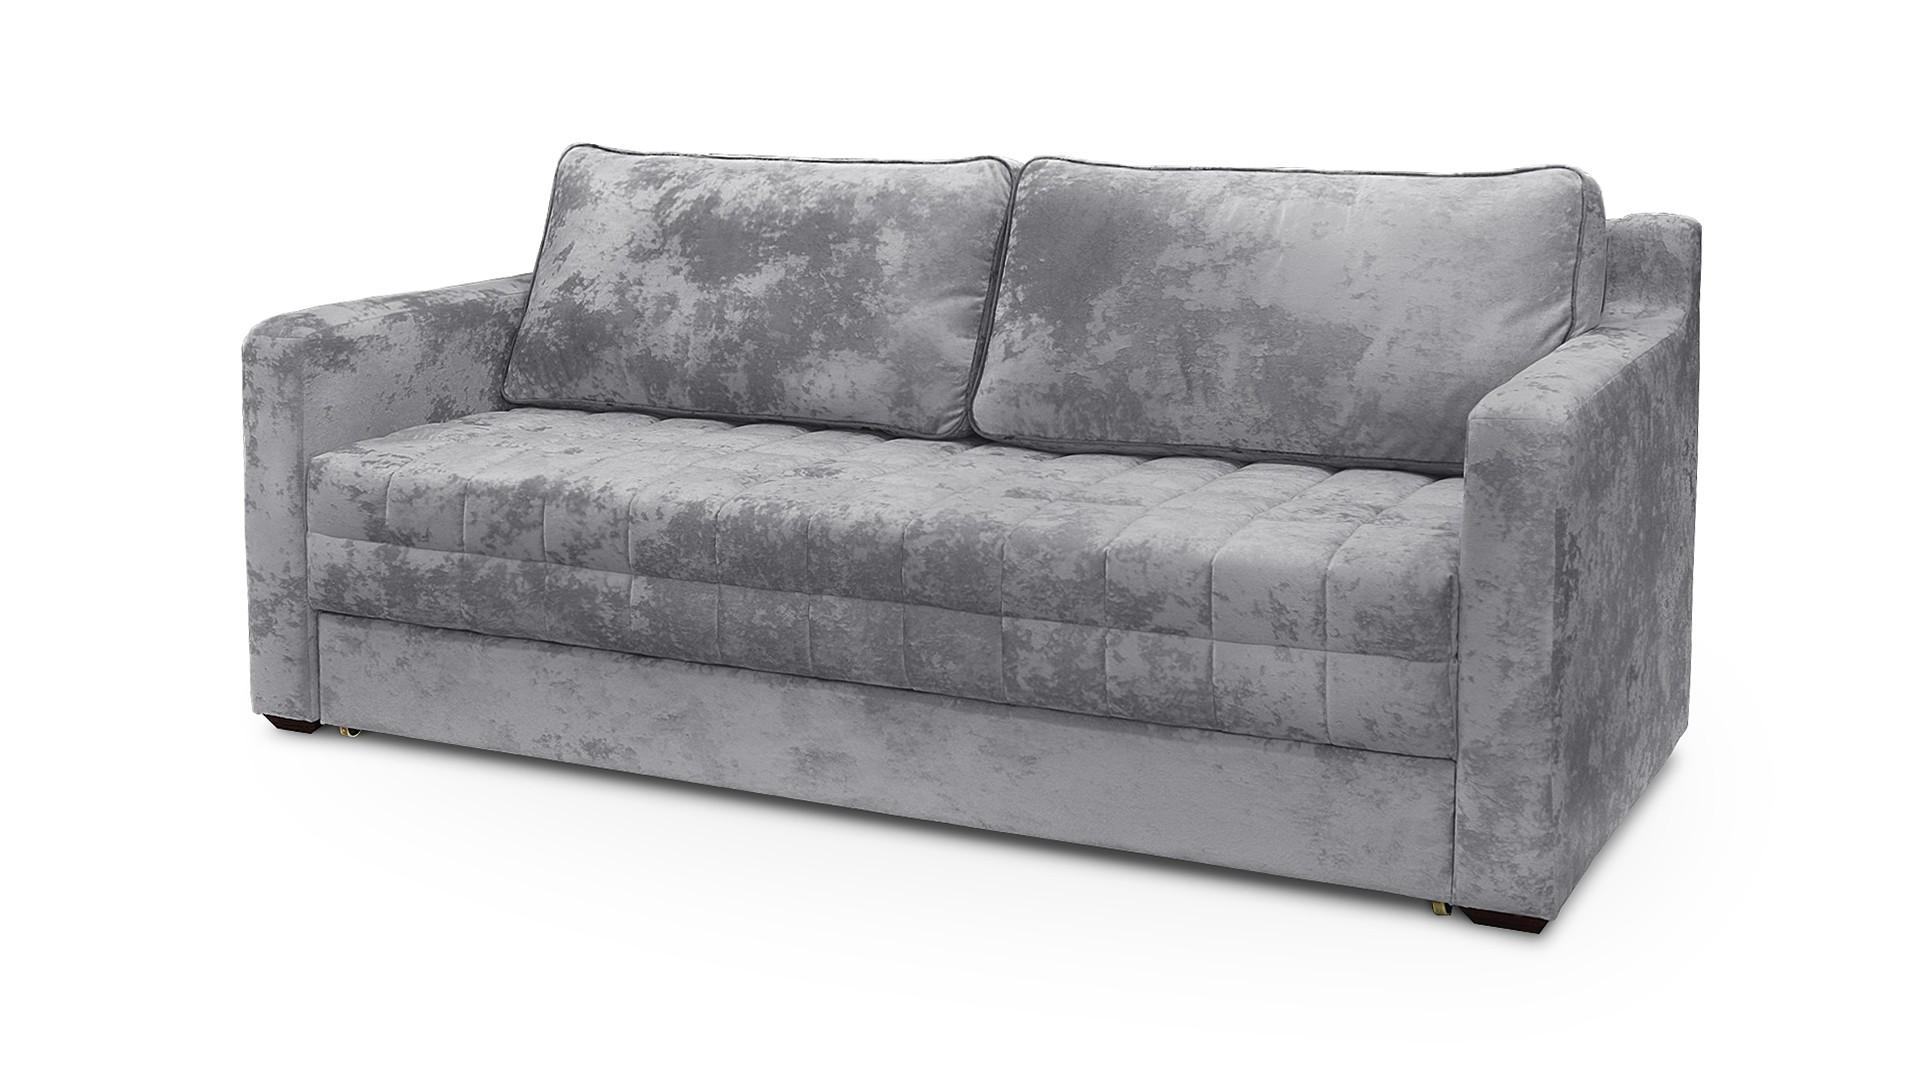 Диван лайт (fiesta) серый 217x90x95 см.